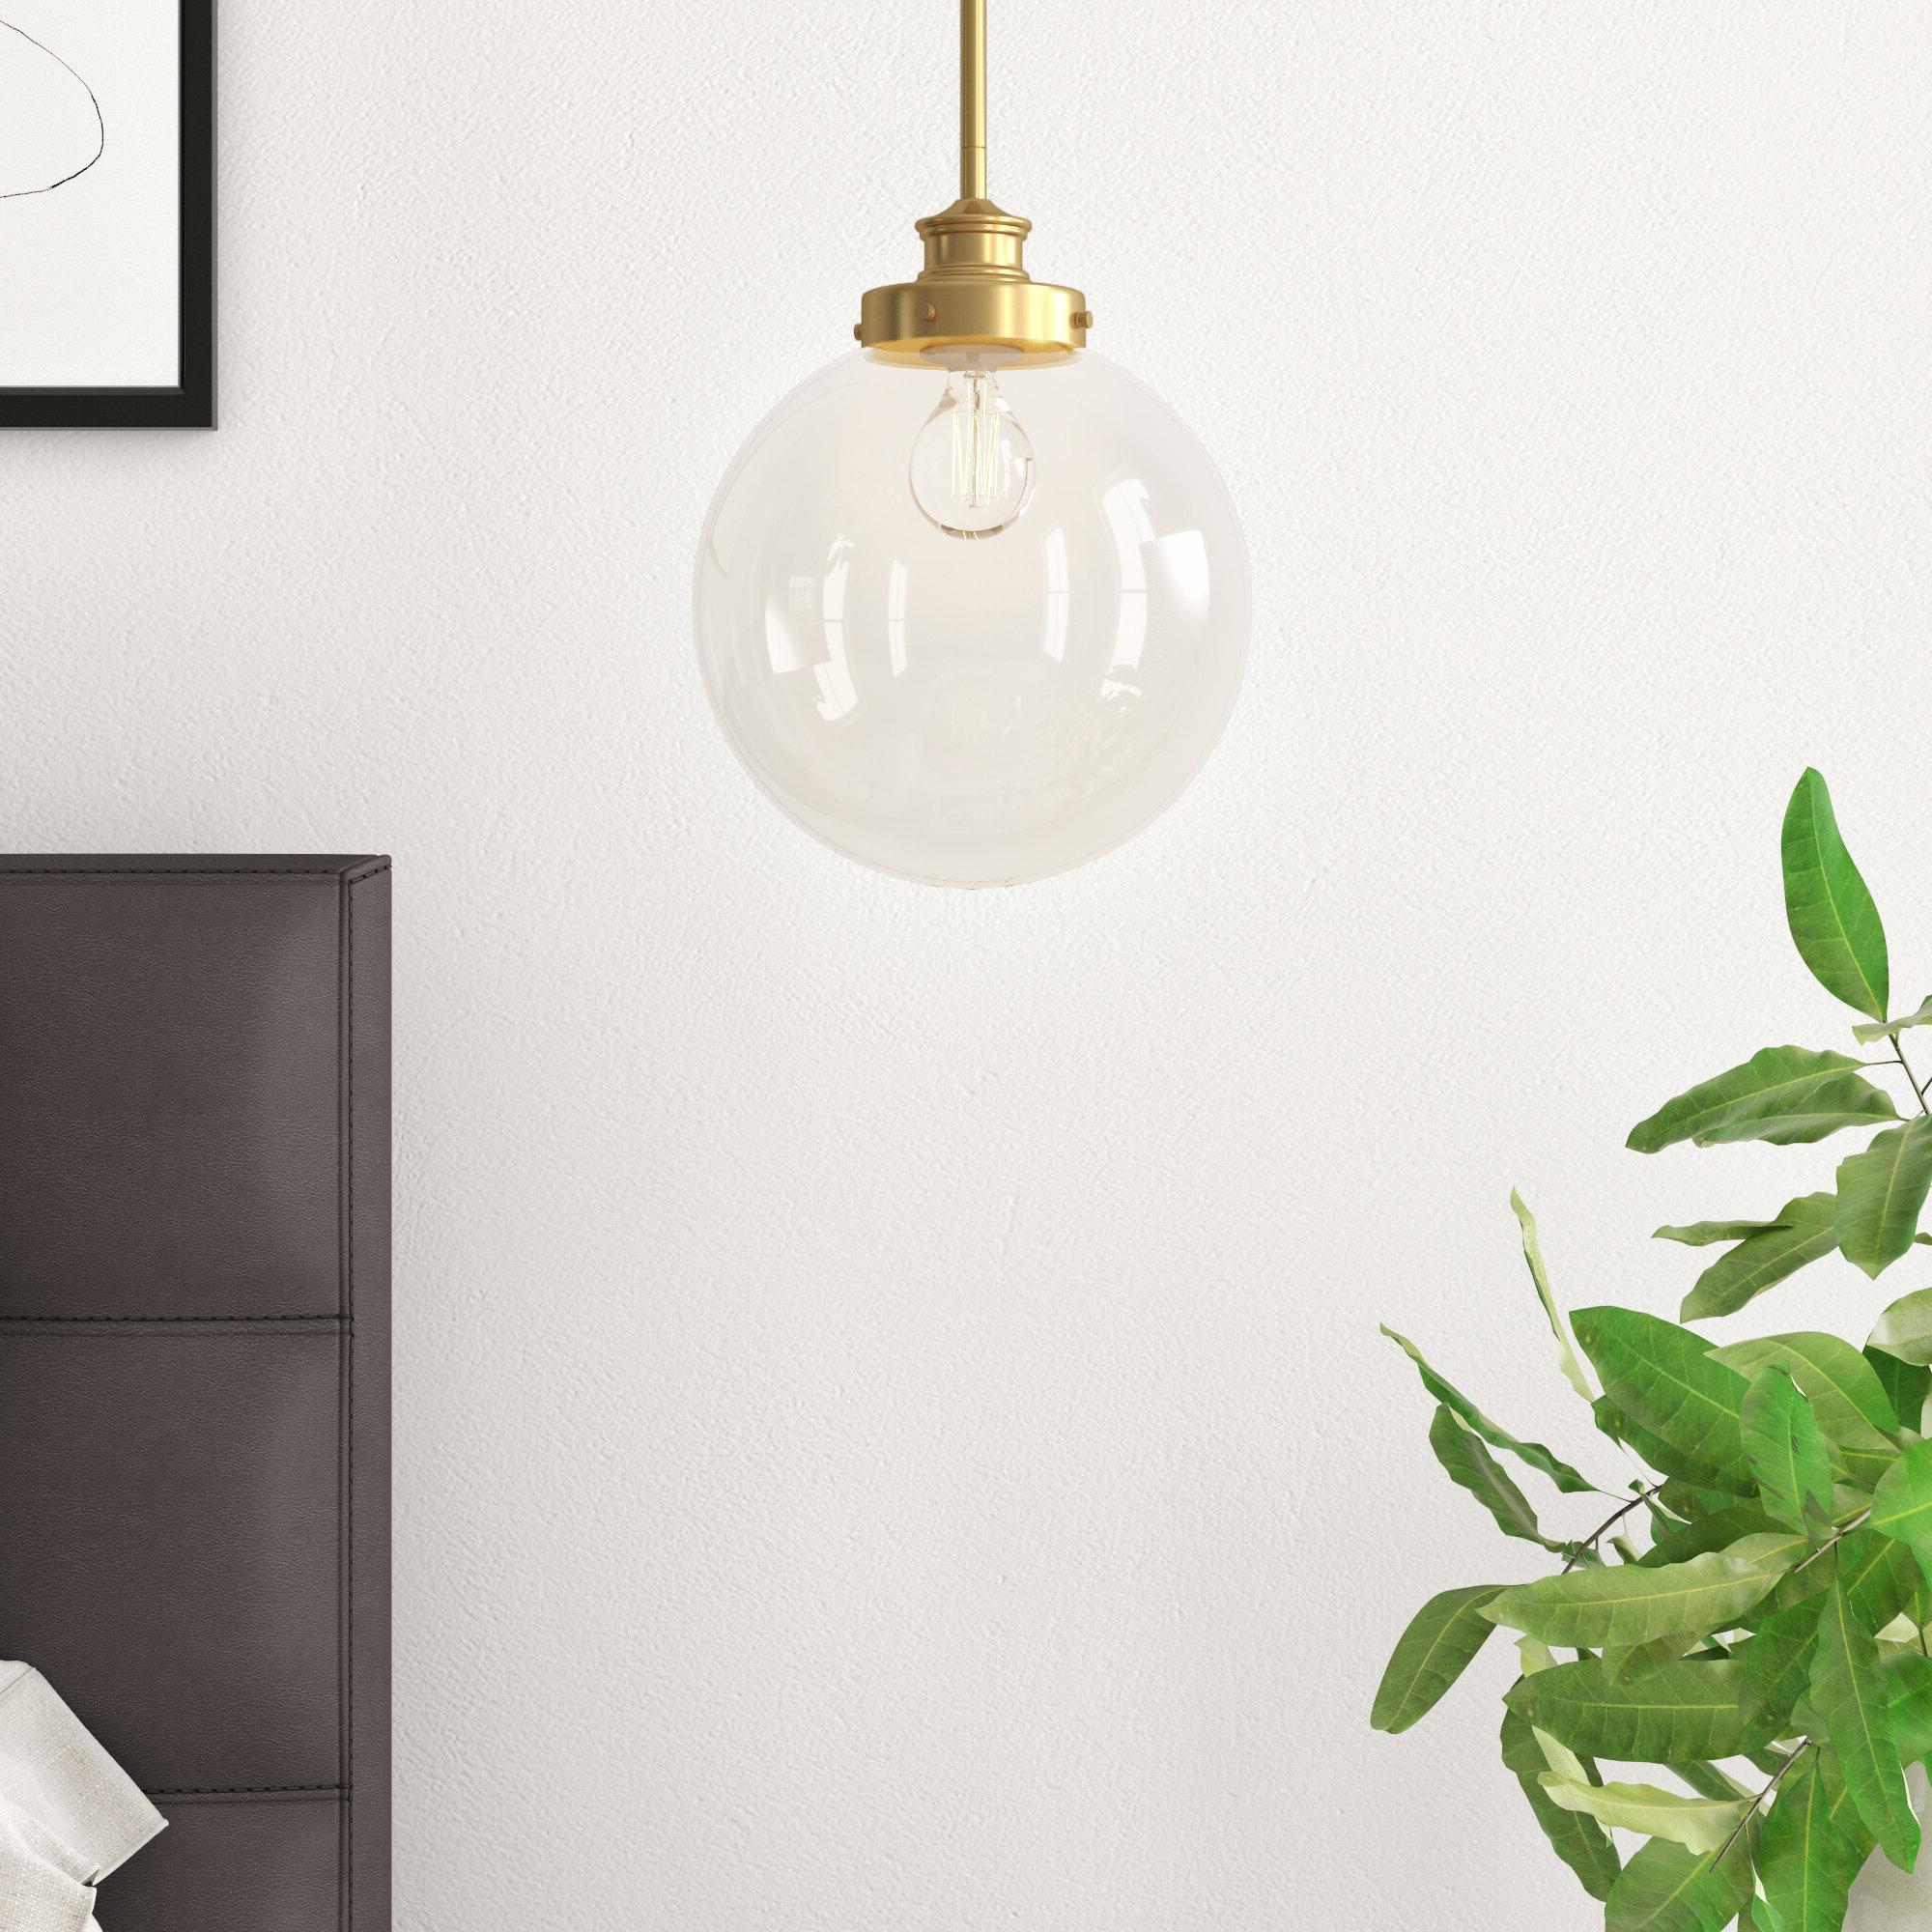 Cayden 1 Light Single Globe Pendant Regarding Preferred Betsy 1 Light Single Globe Pendants (View 5 of 20)